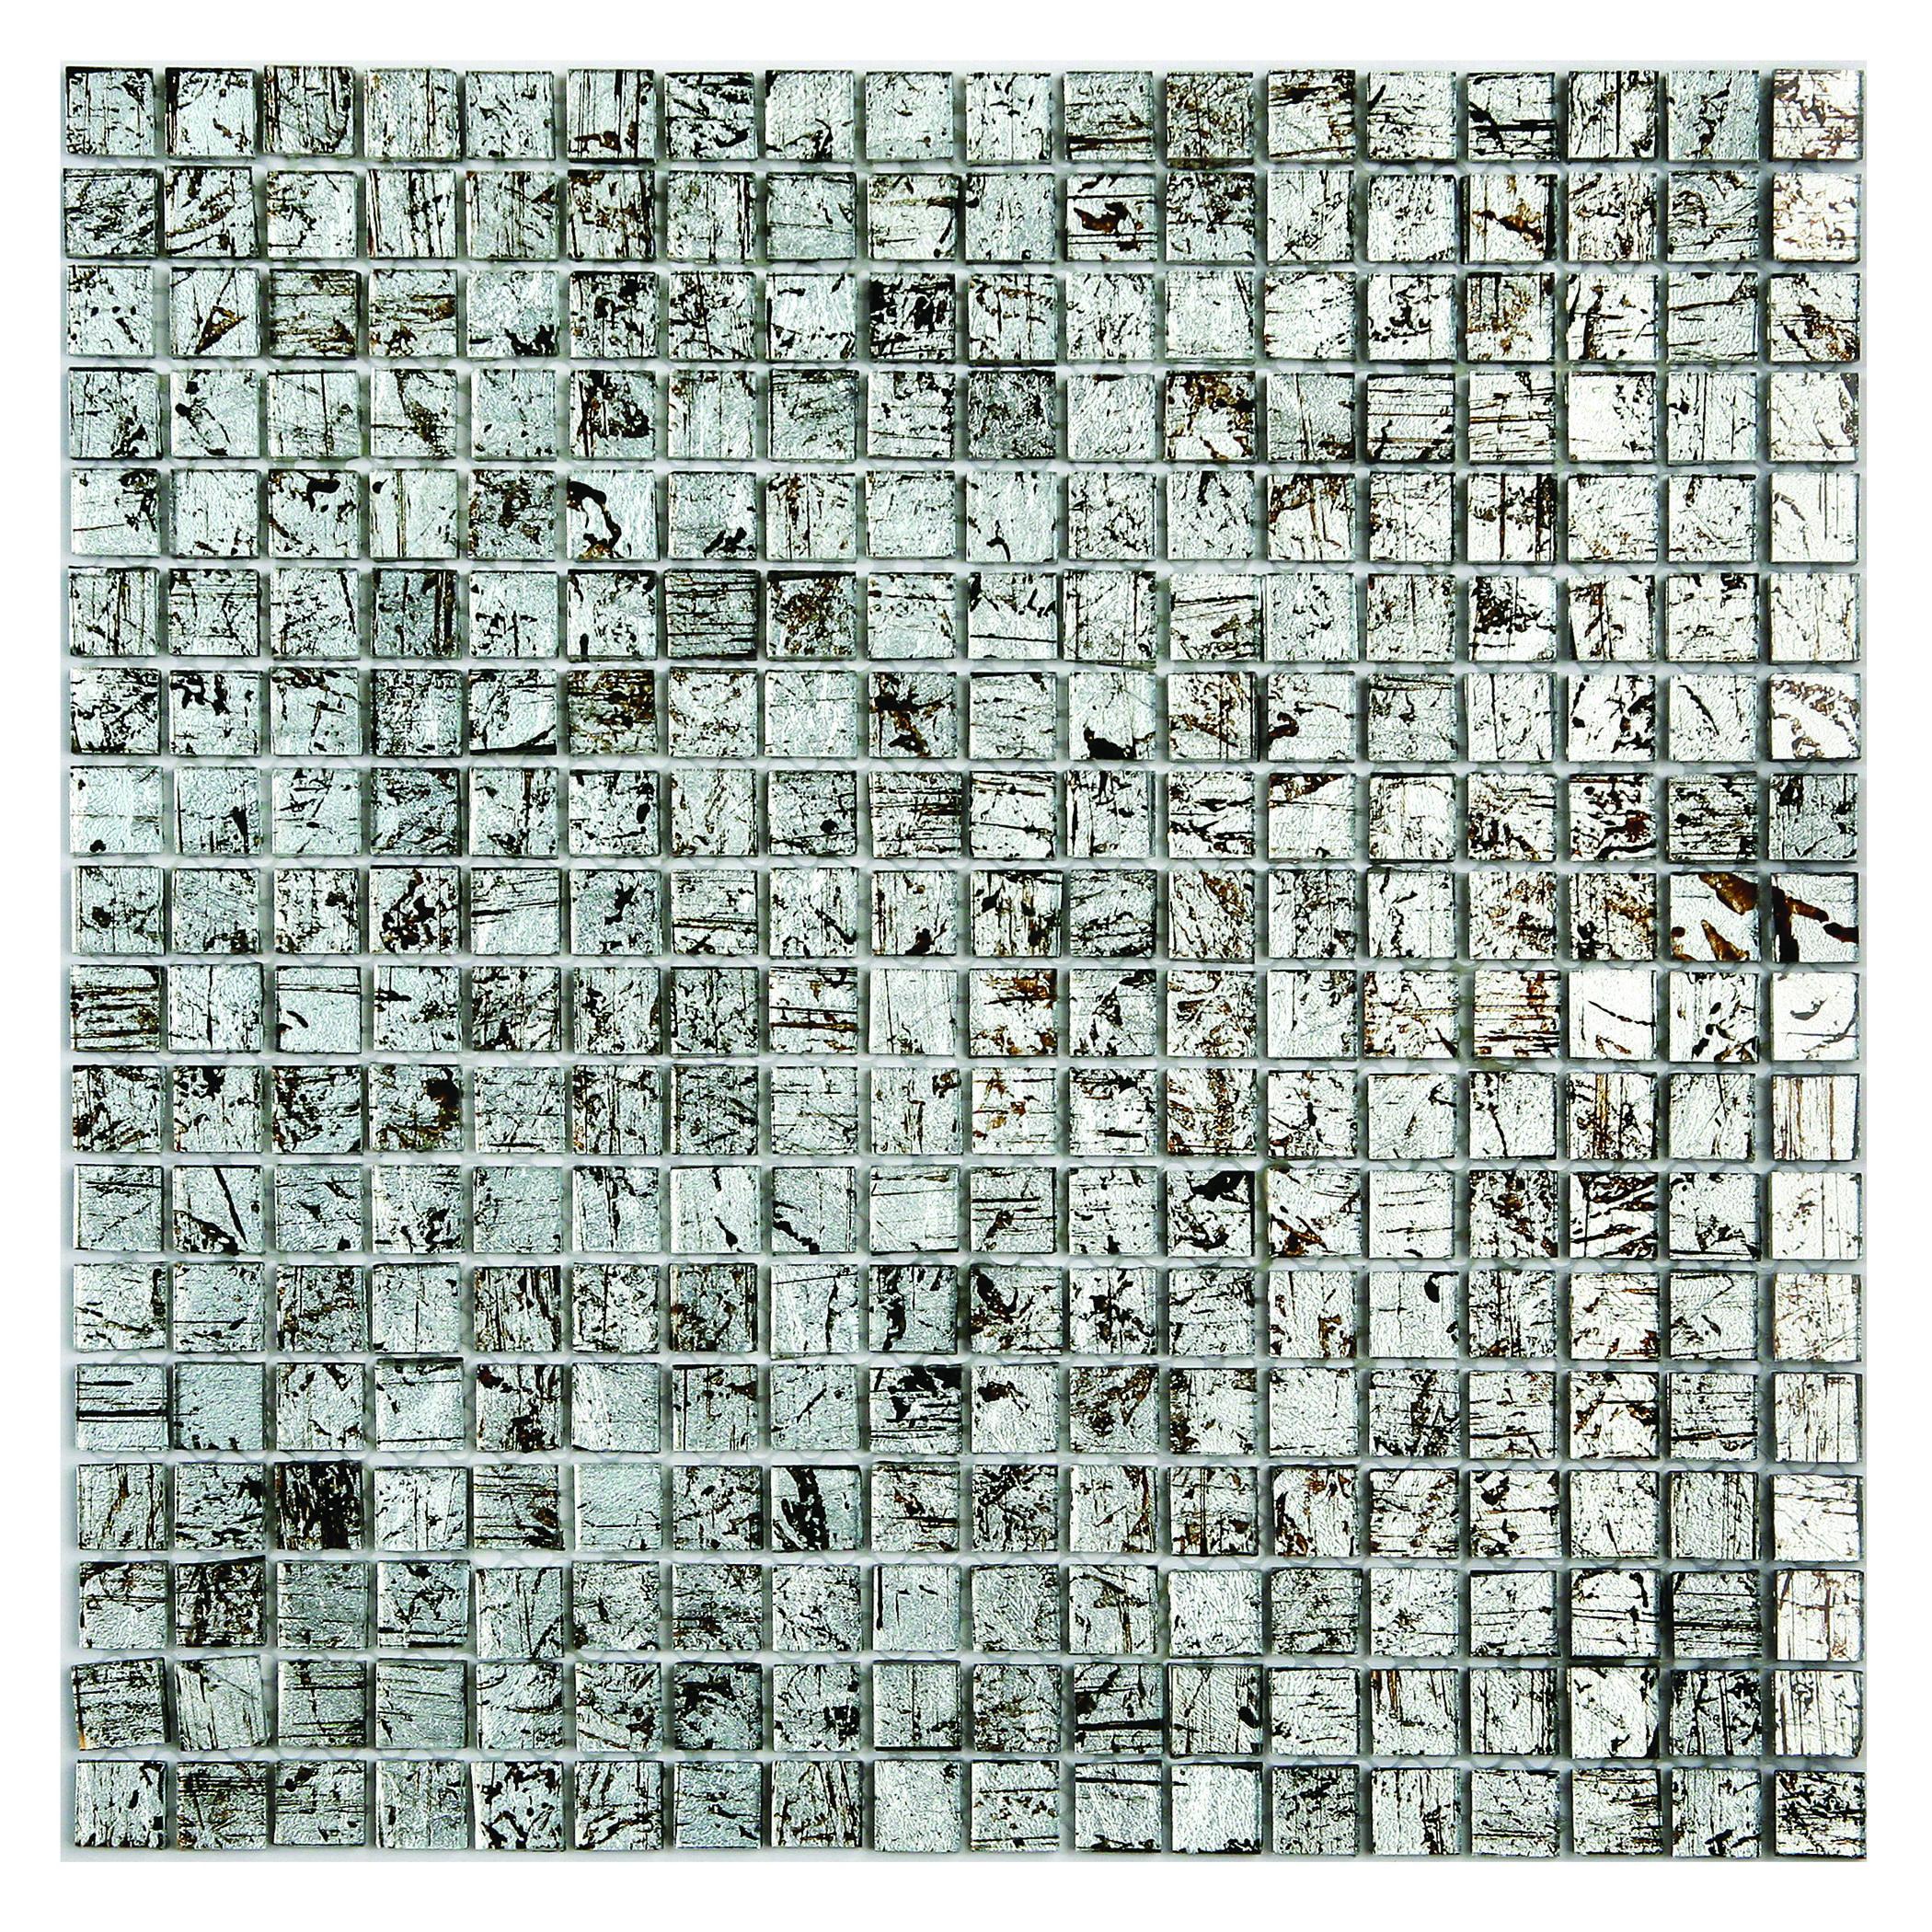 Winter Birch Micro Folia Glass Mosaic Wall Tile 0